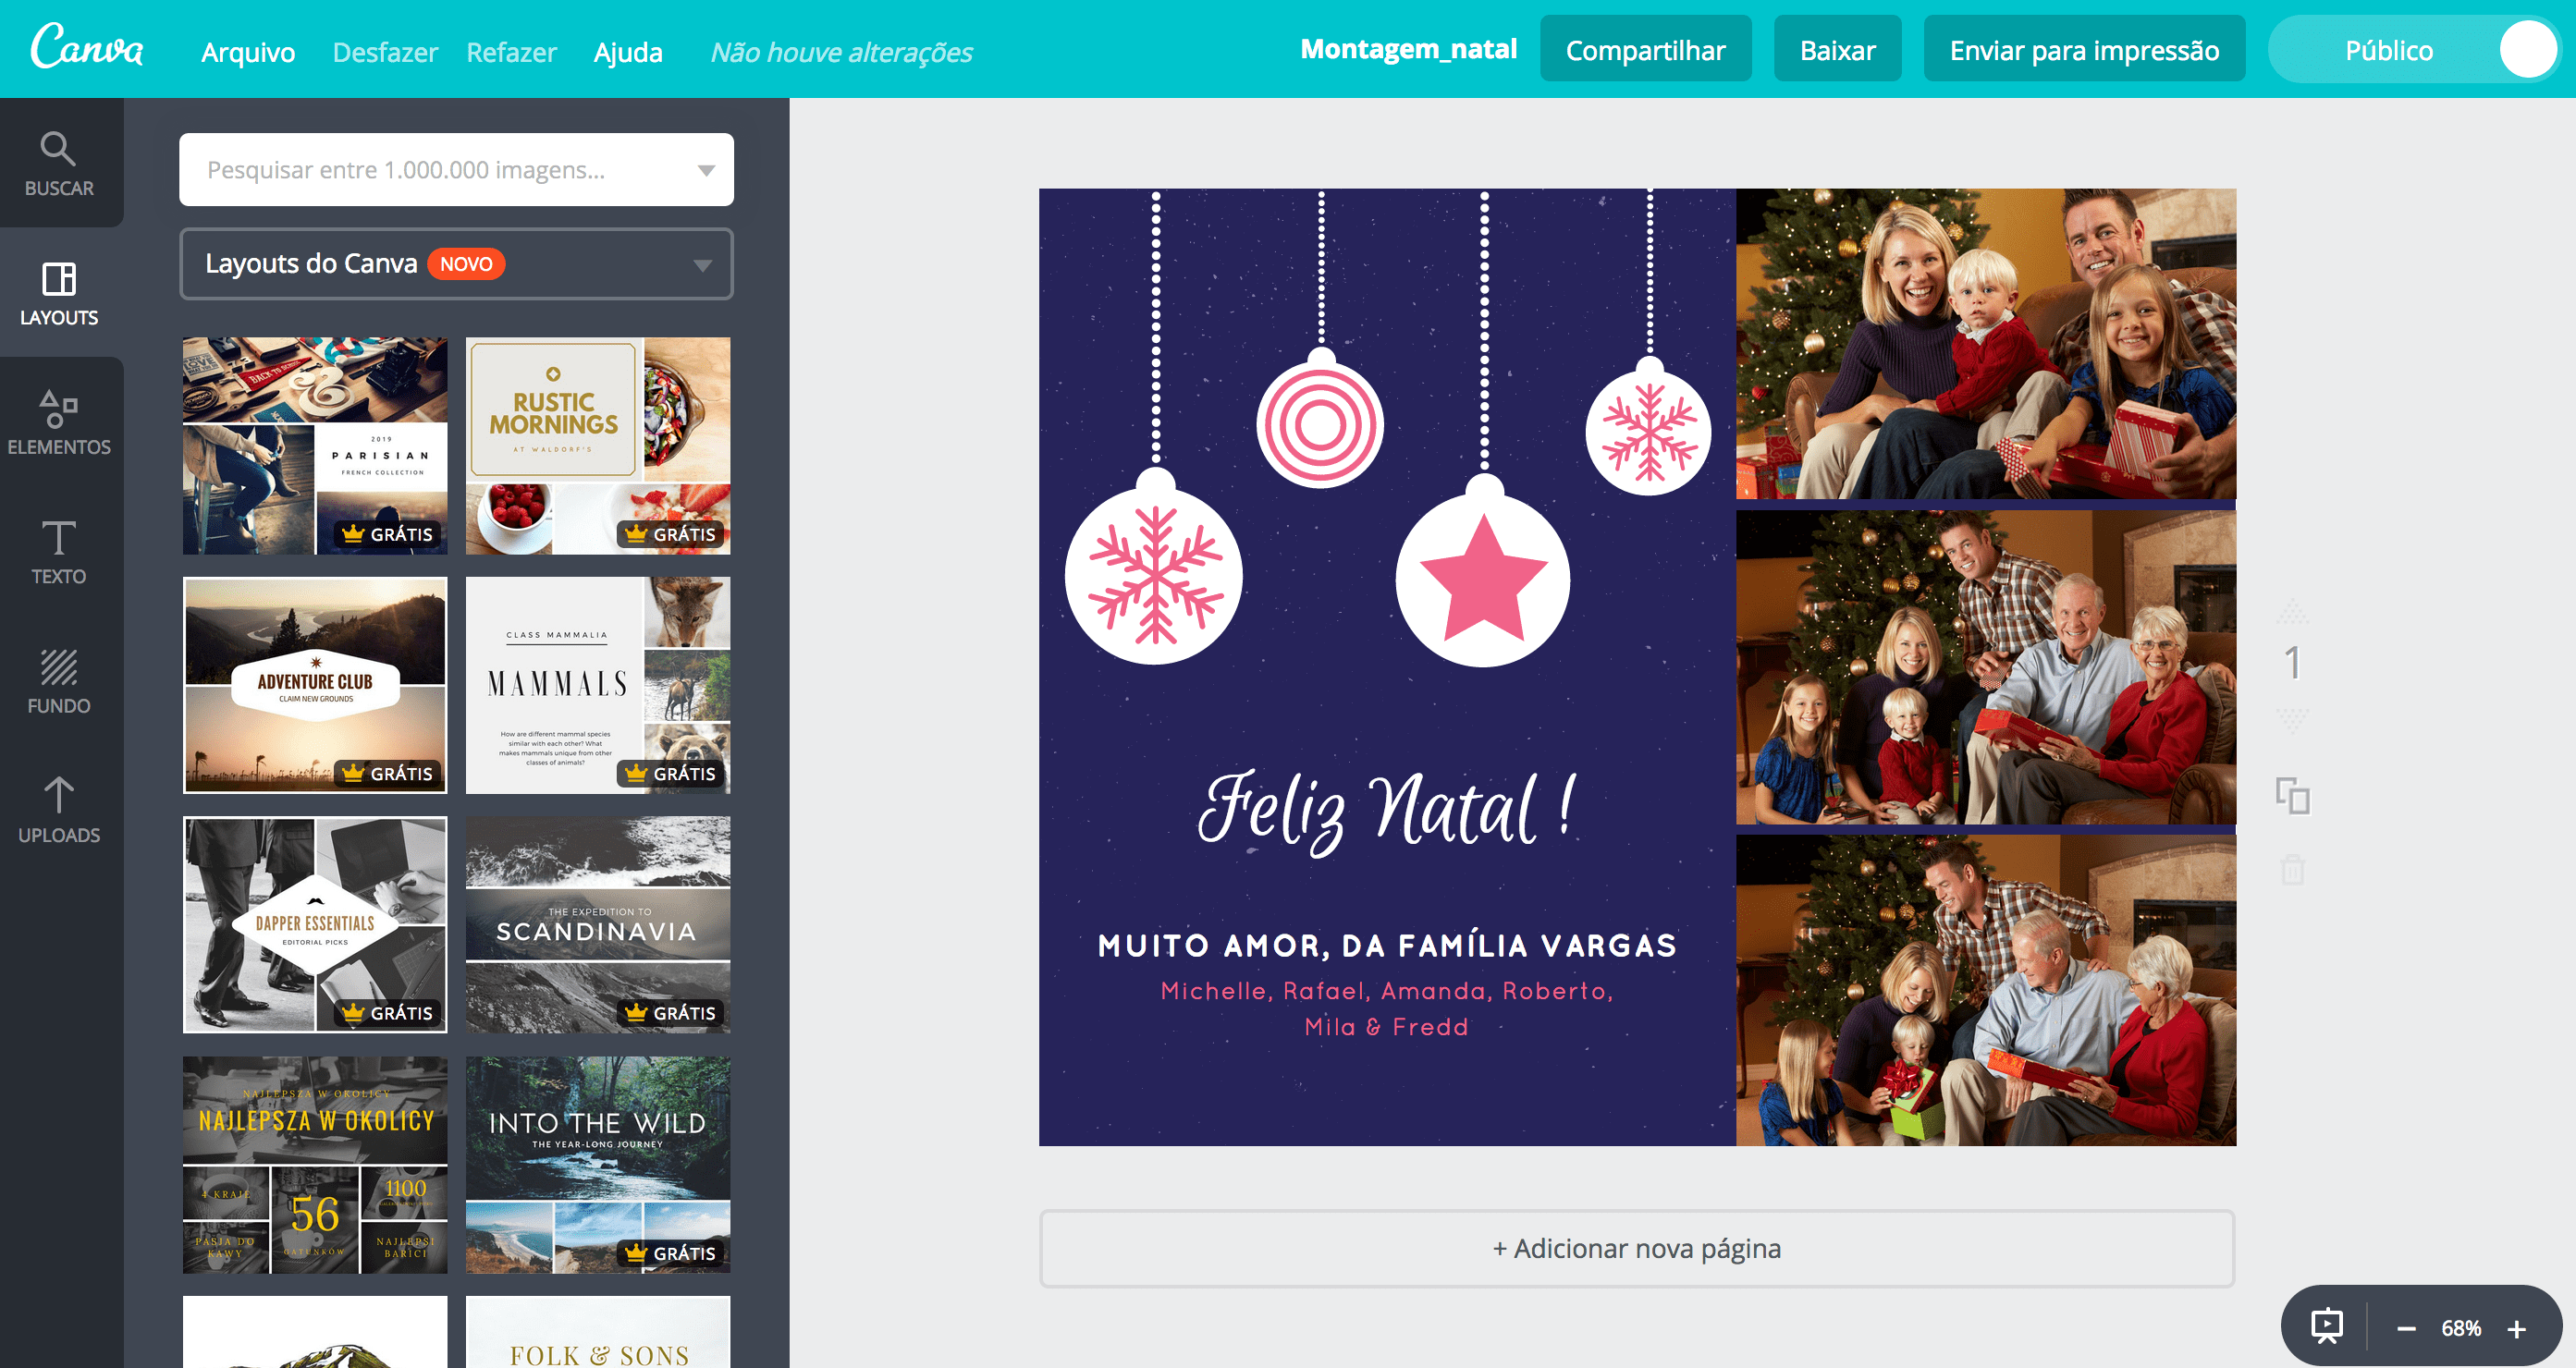 Montagem de fotos de Natal